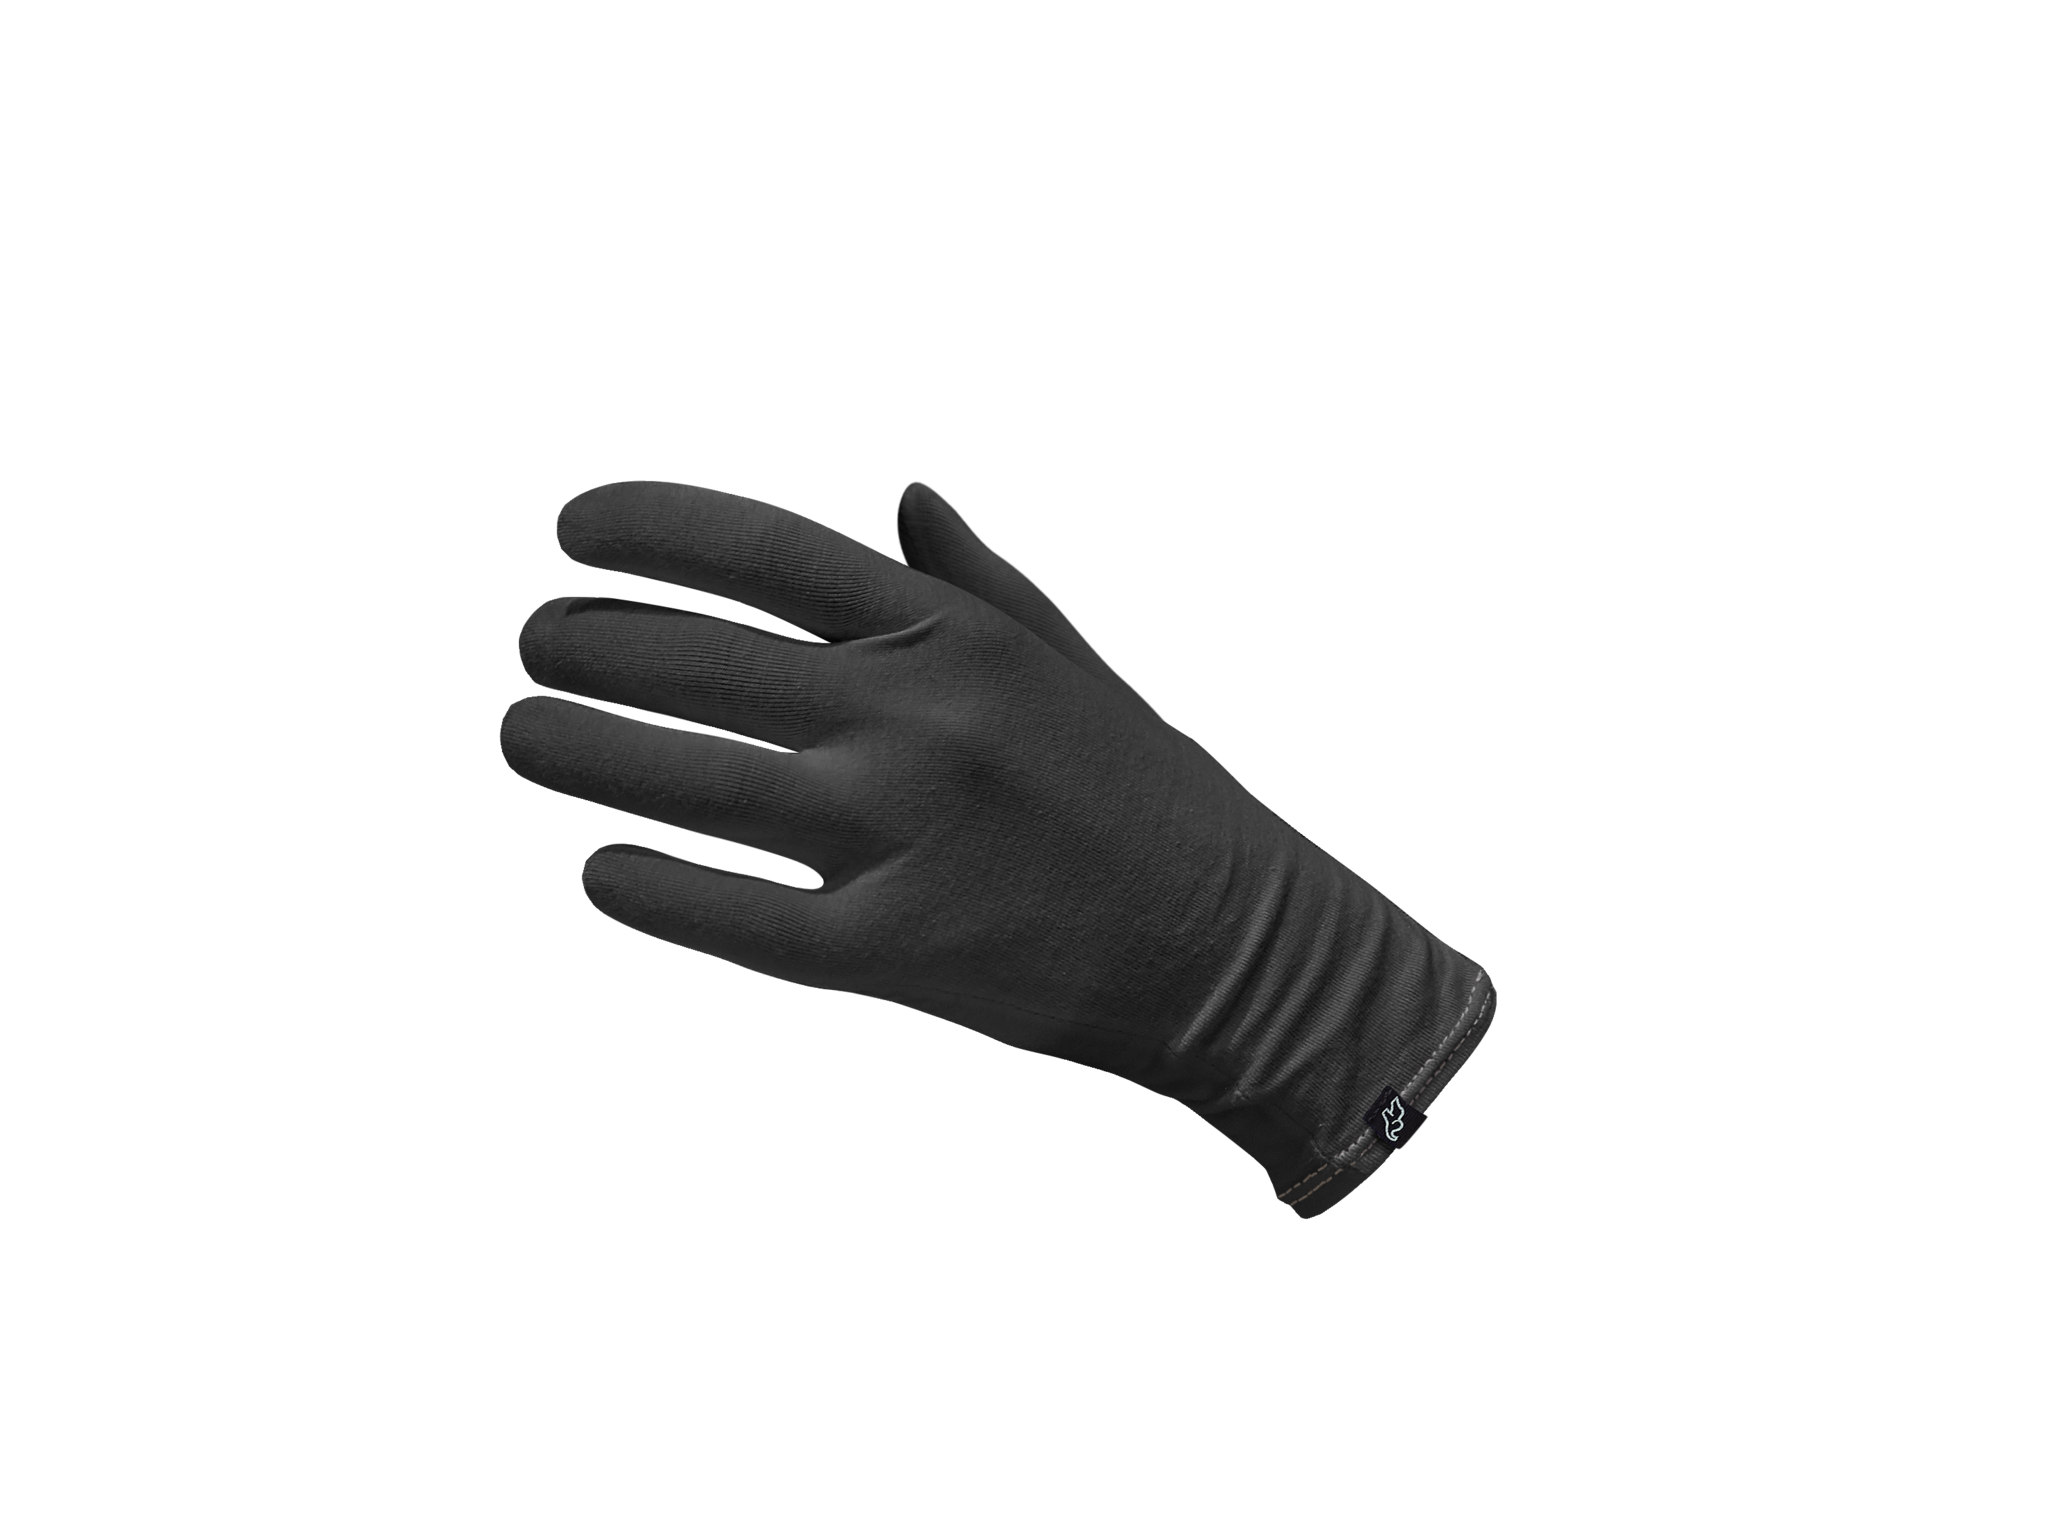 ElephantSkin Gants Noirs - Taille : S/M - 1 paire